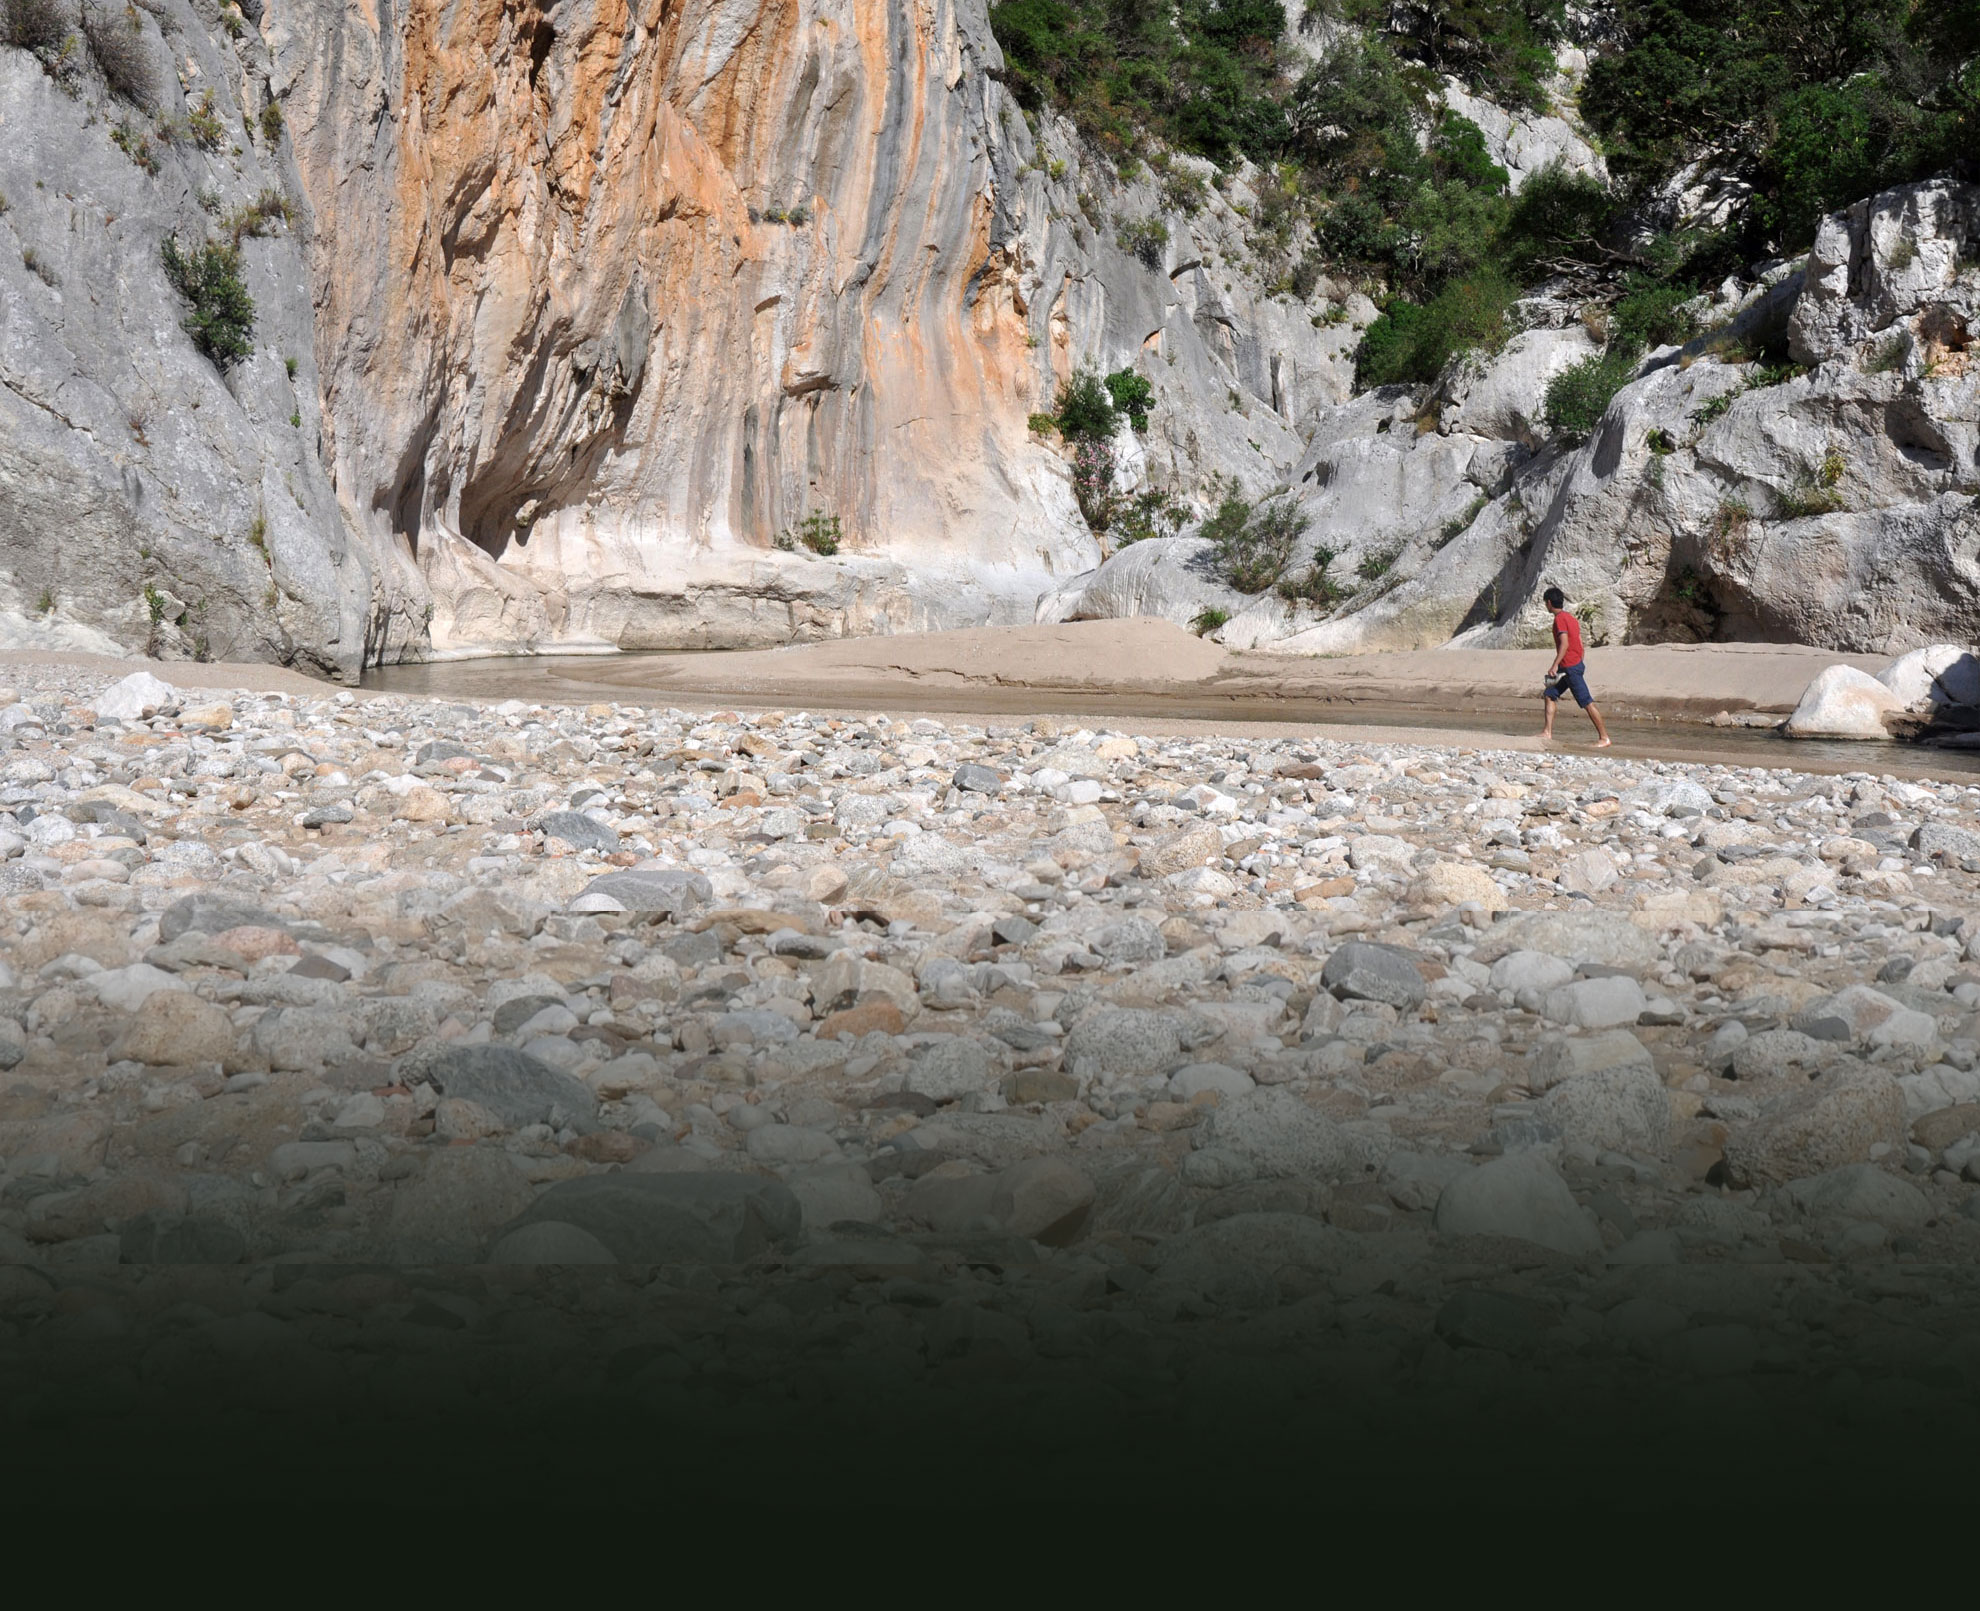 Rio Flumineddu - Oliena